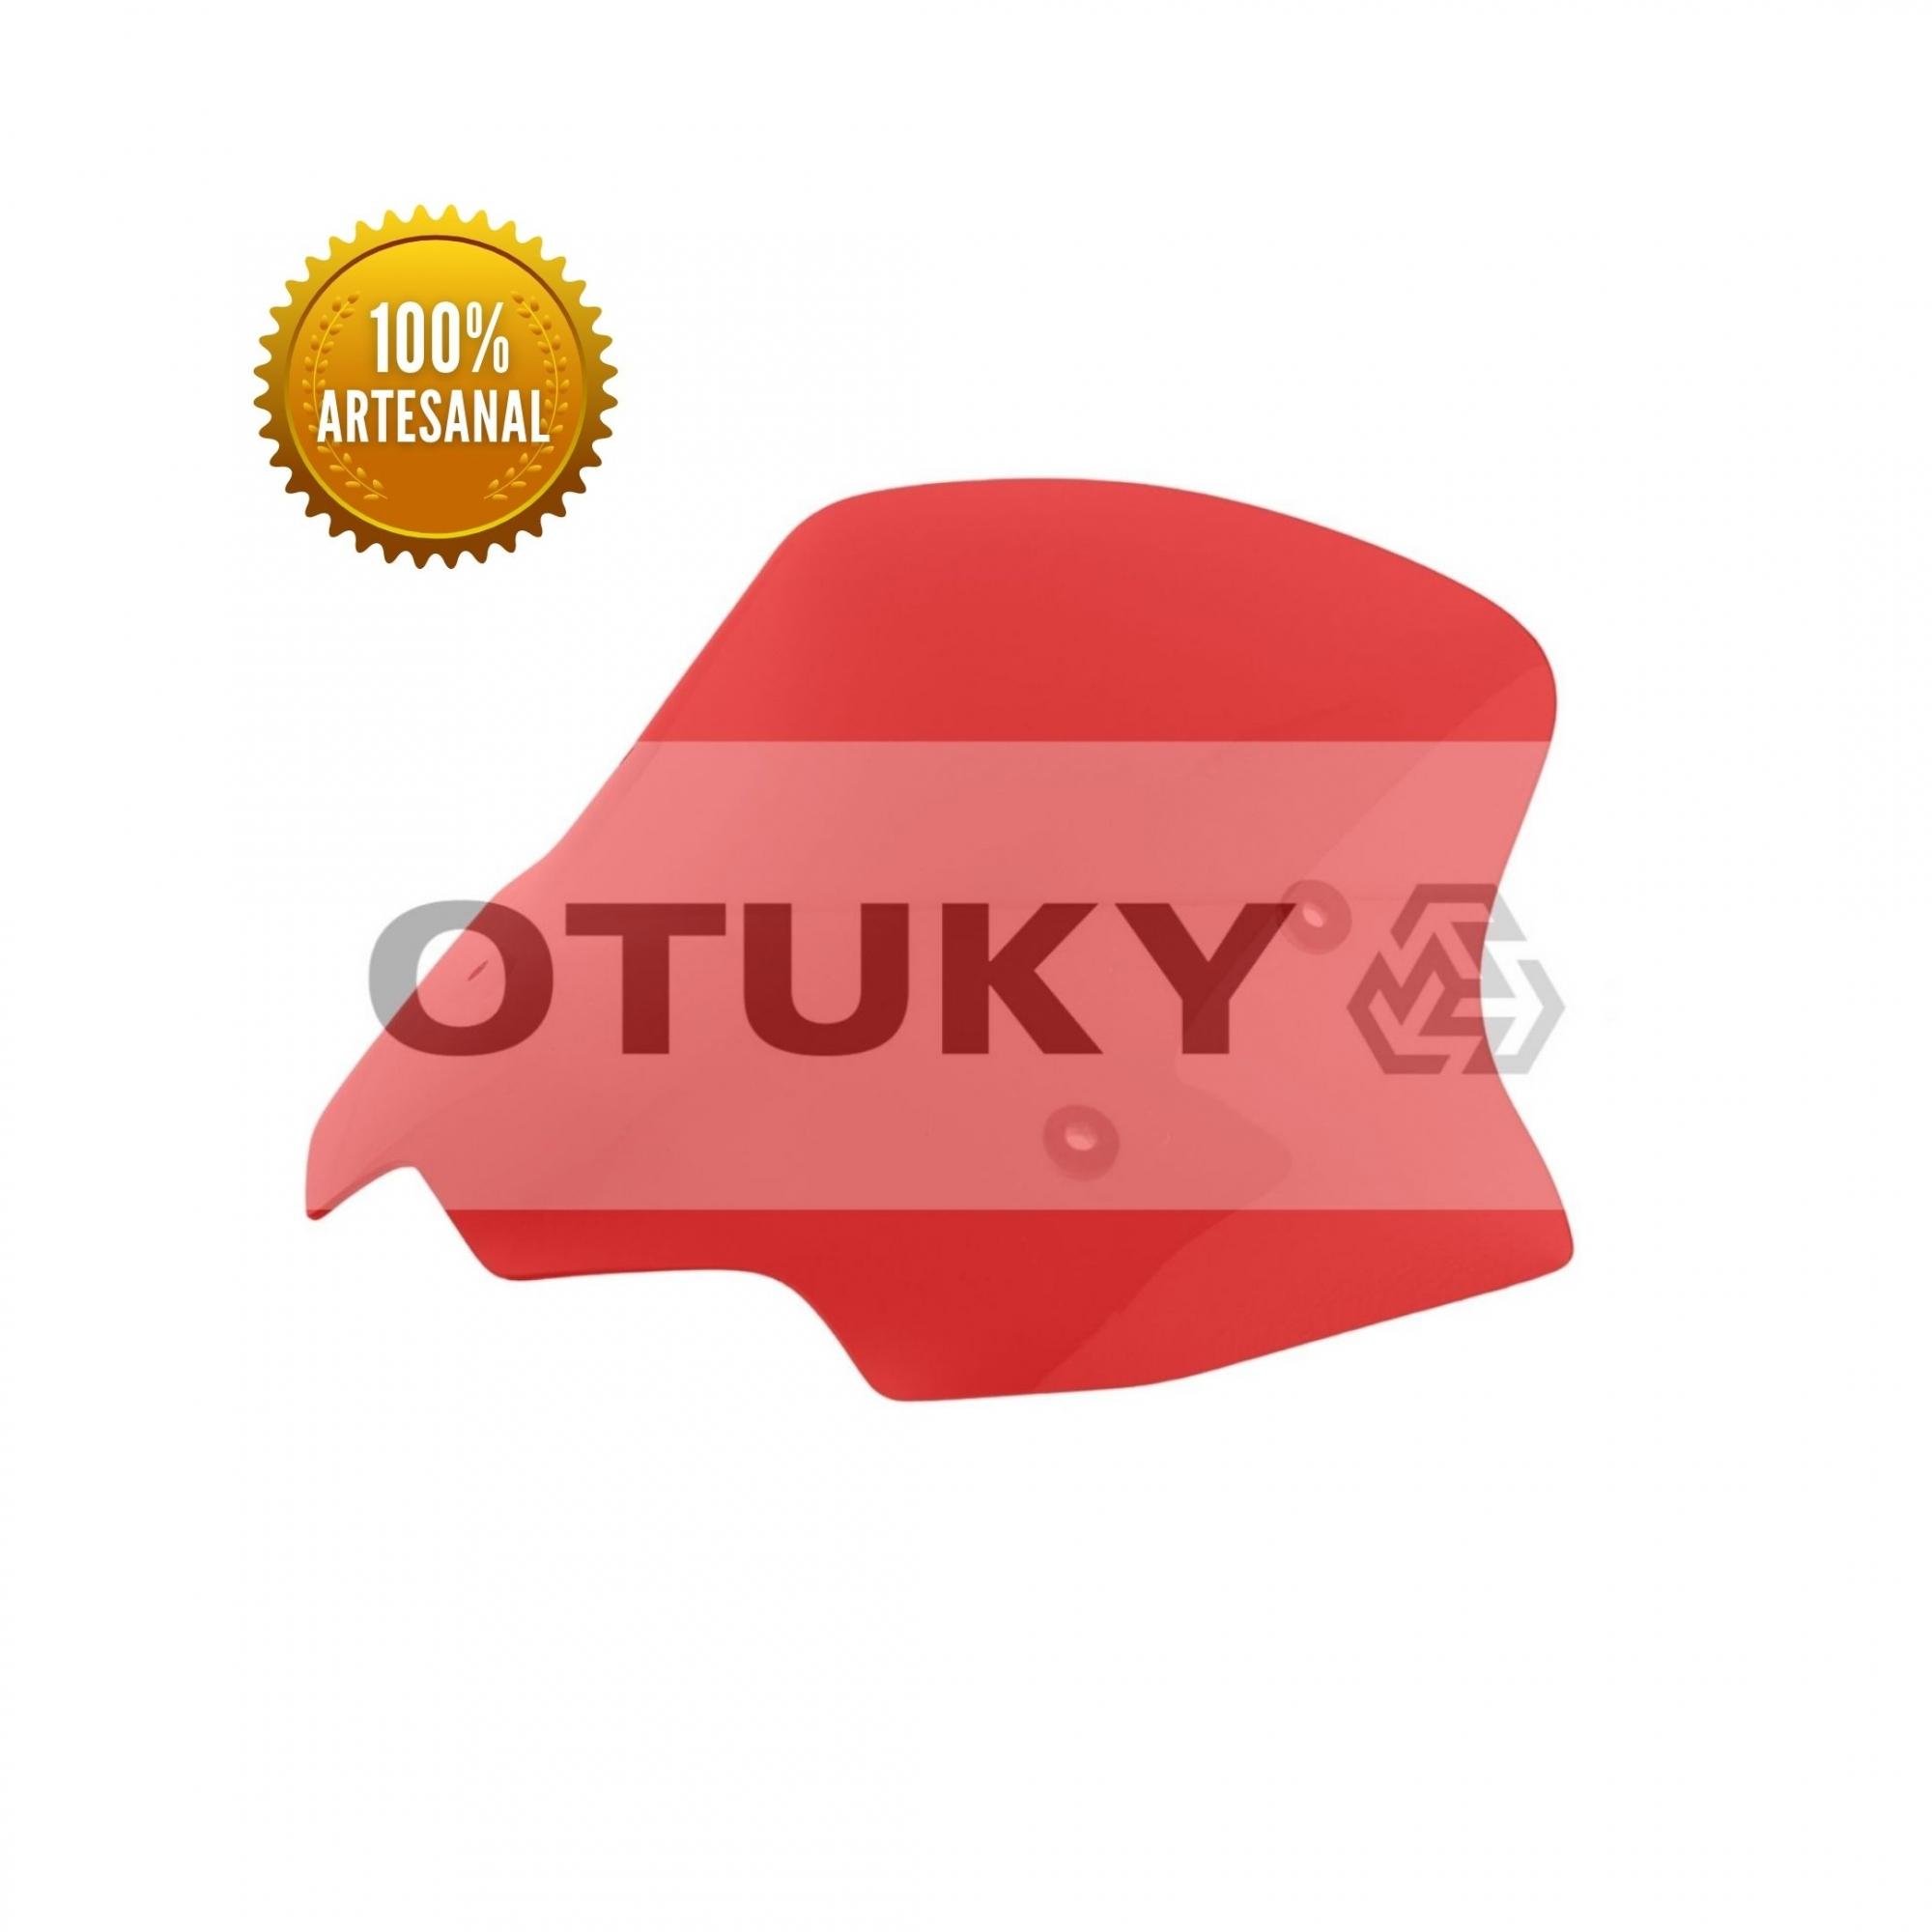 Bolha para Moto CB 500 X 2014 2015 2016 2017 Otuky Padrão Vermelho